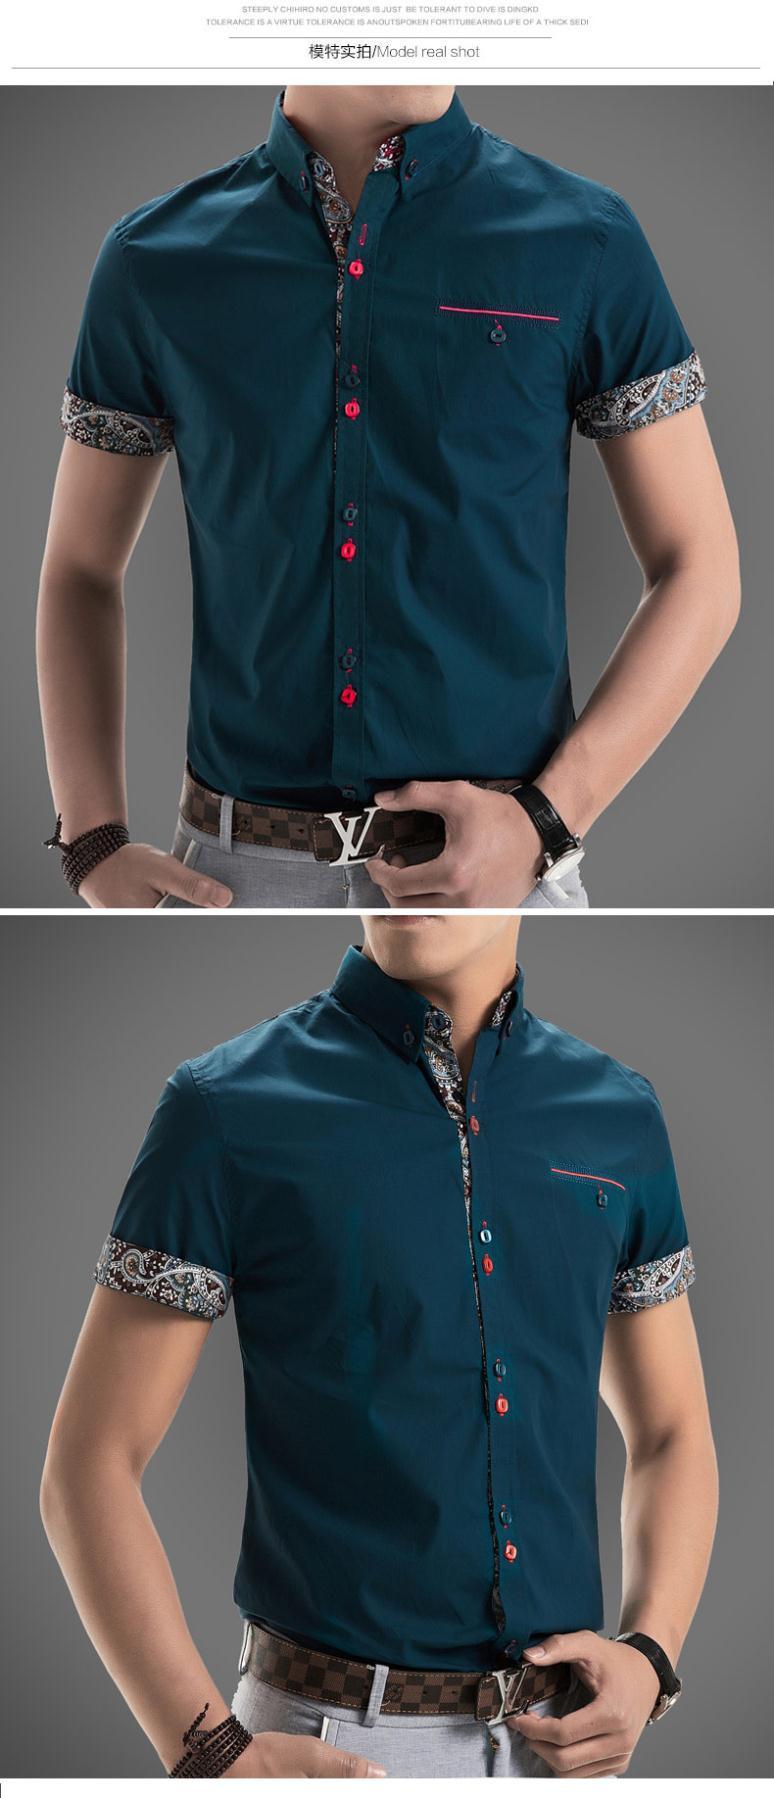 2015 Men Shirt New Brand Shirts Short Sleeve Casual Shirt Men Slim Fit Brand Design Formal Shirt Camisa Social Chemise Homme5